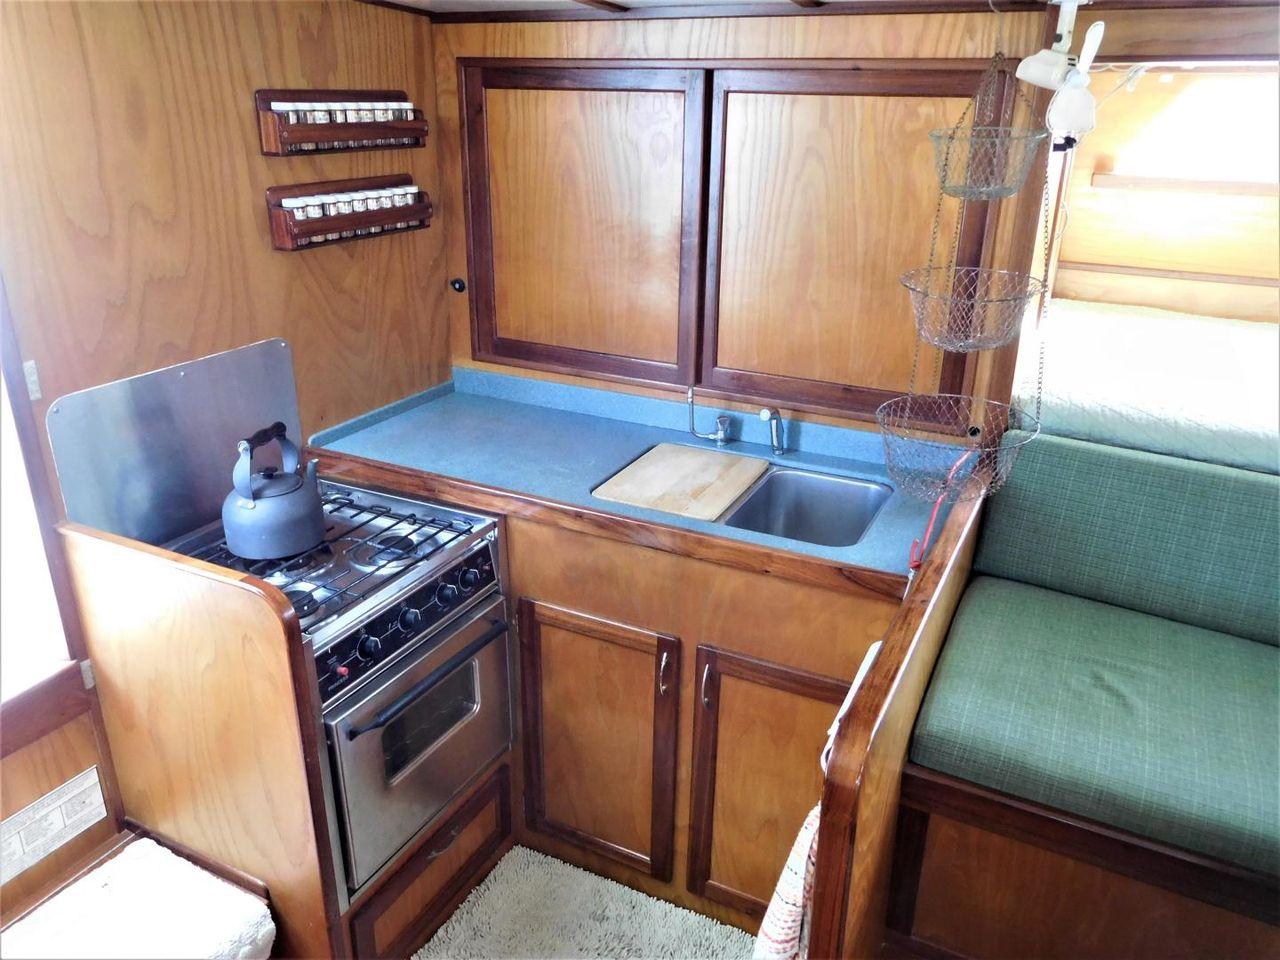 1974 Used Norman Cross Trimaran Sailboat For Sale - $75,000 - San